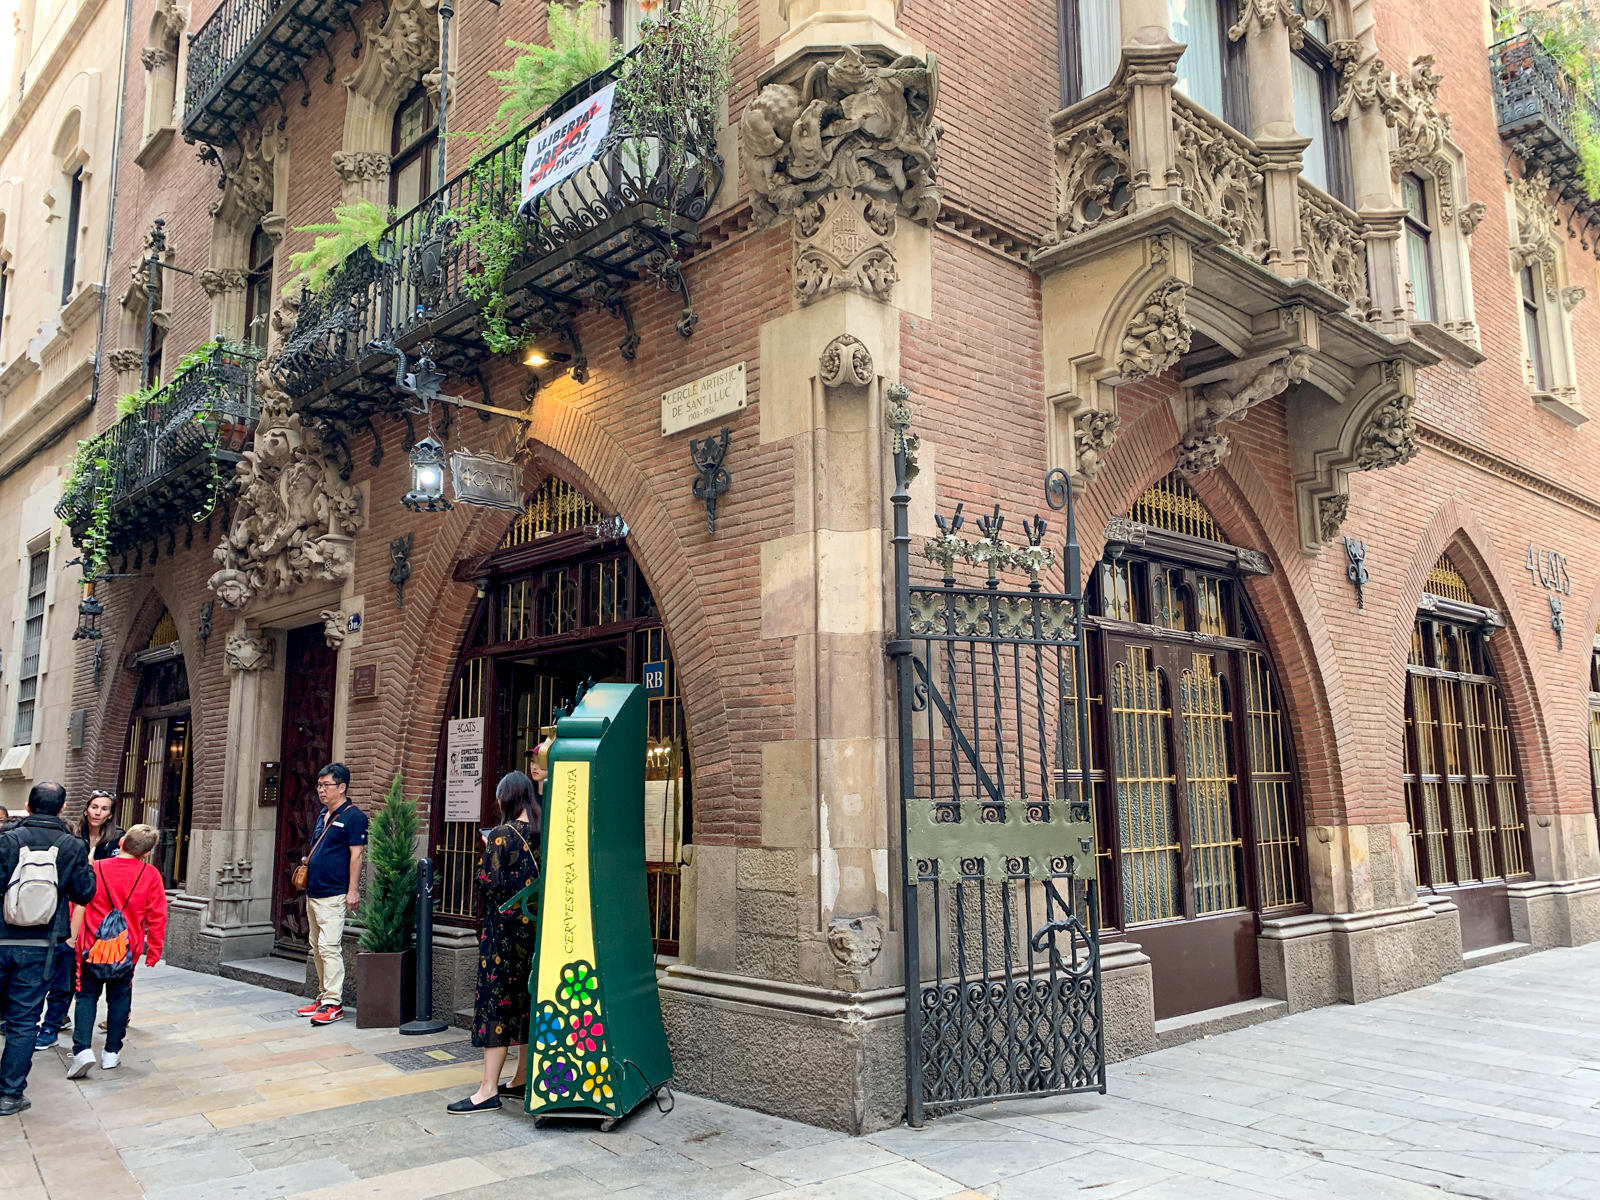 Outside Els 4Gats restaurant in Barcelona's Gothic Quarter